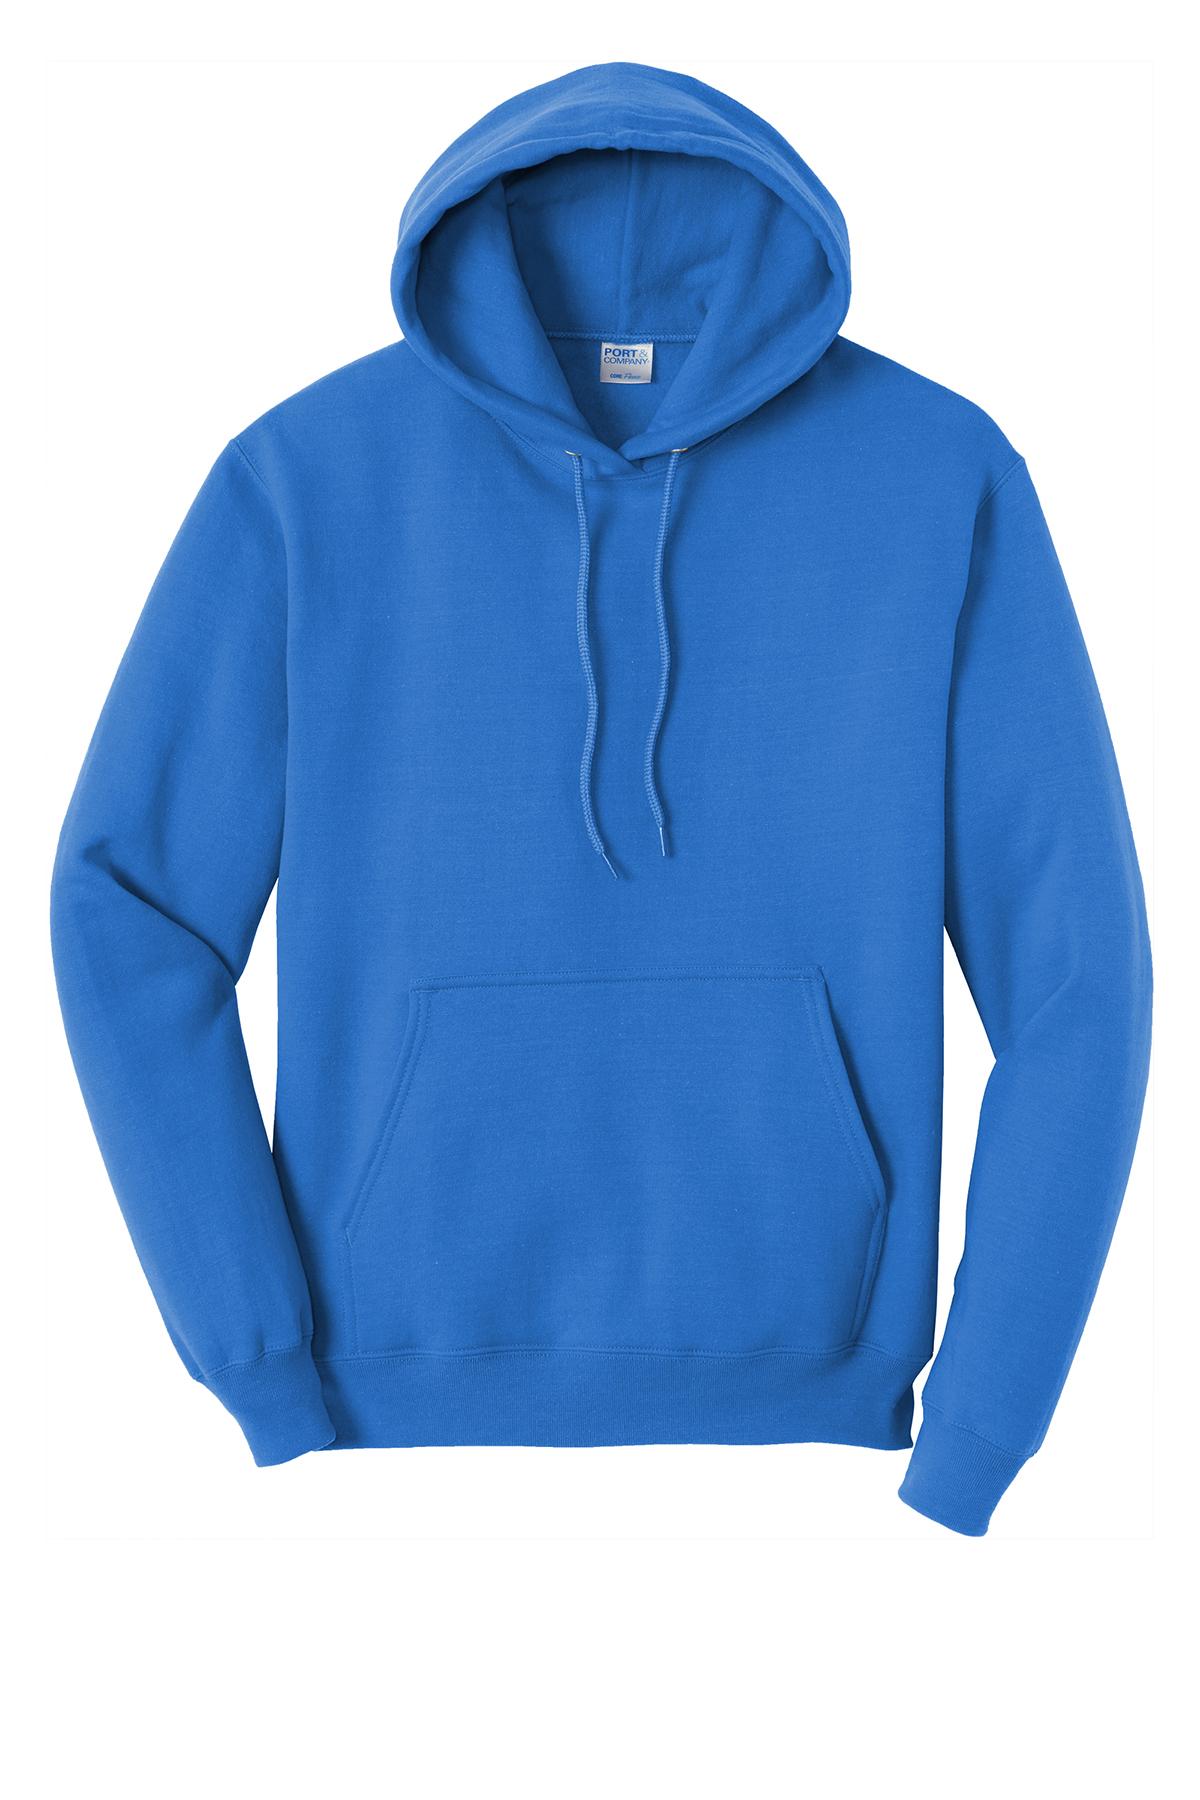 Port & Company ® PC78HT - Tall Core Fleece Pullover ...